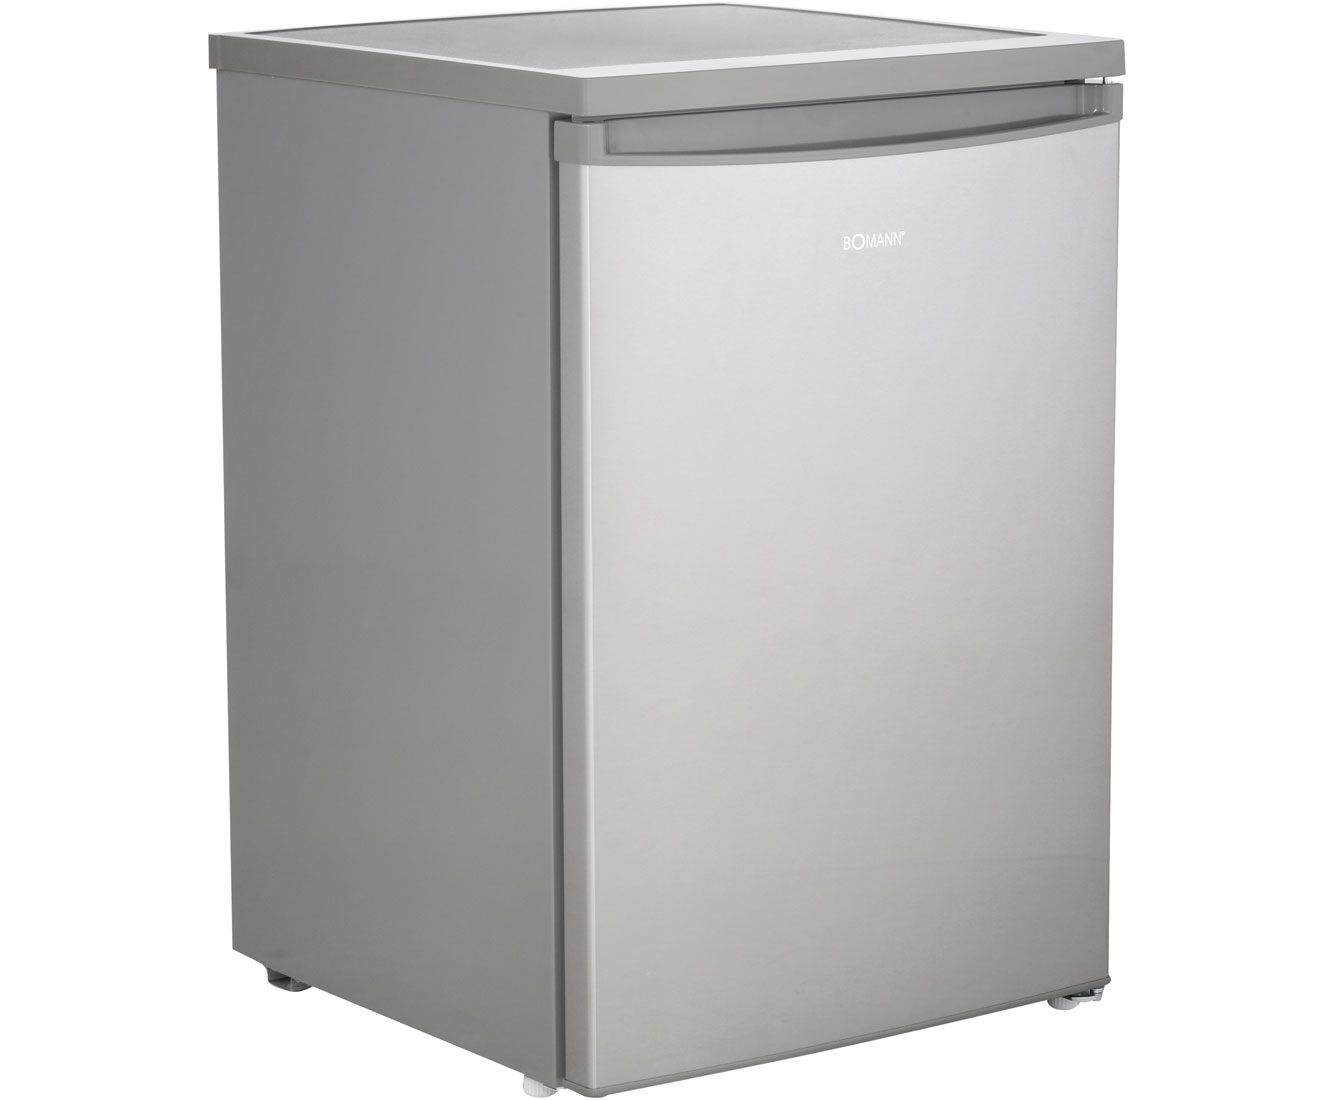 Mini Kühlschrank Für Kaffeeautomaten : Vintage industries kompakt retro kühlschrank kingston in